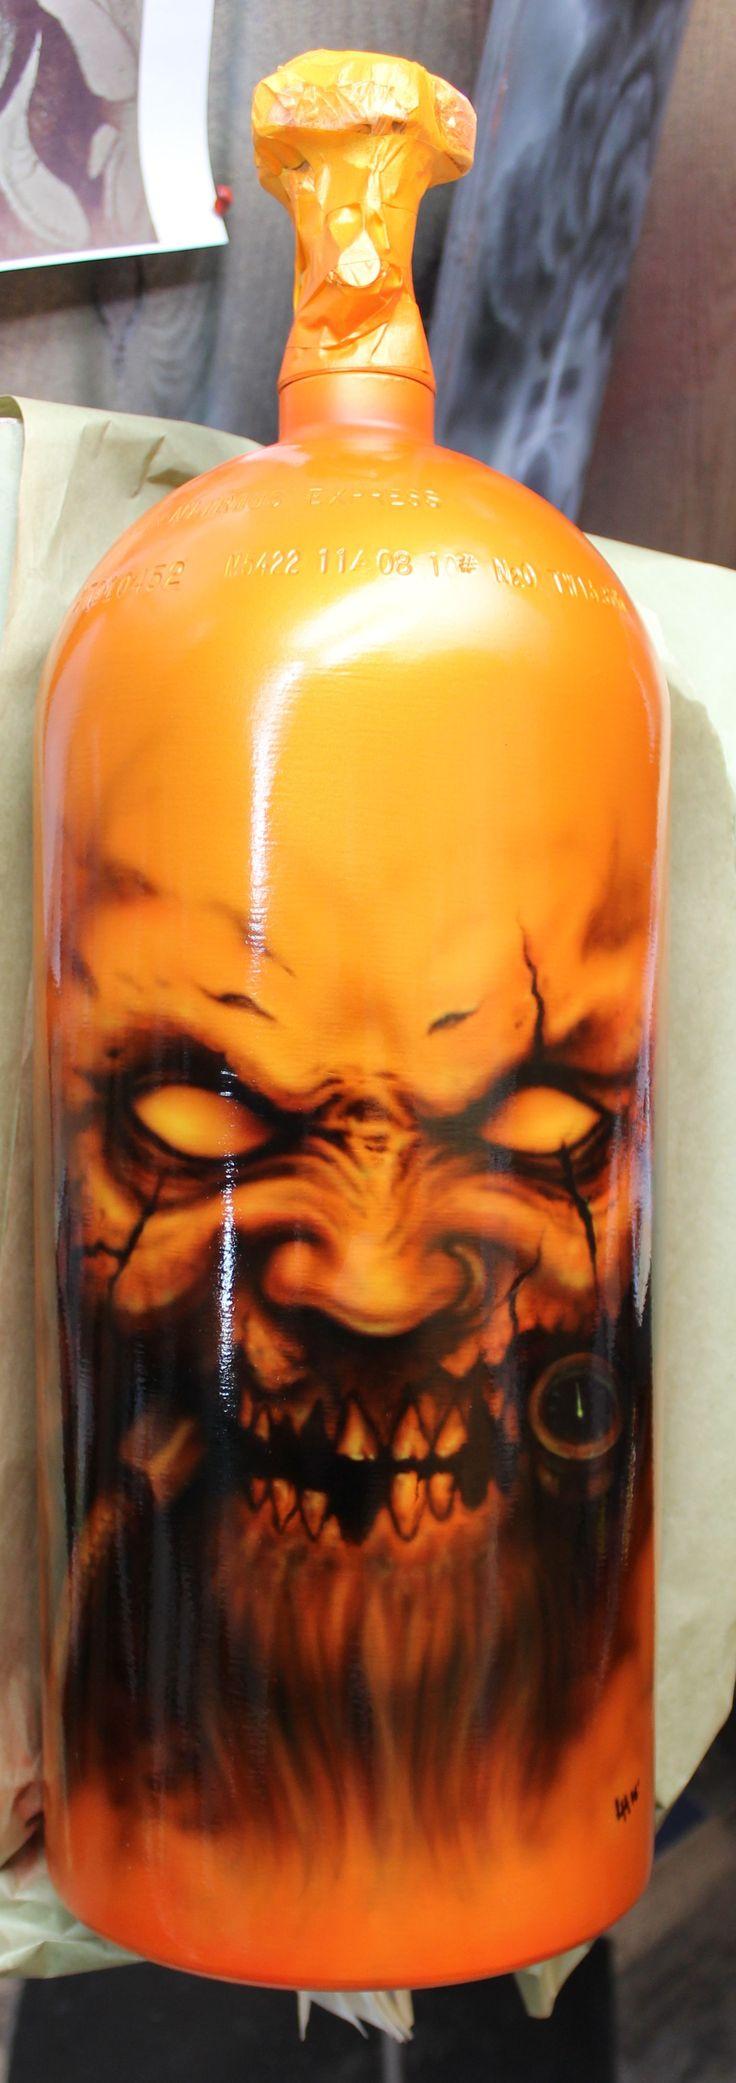 NX Nitro Nitrous bottle custom freehanded airbrush paint job by Layn Hamilton with an Iwata hp-ch